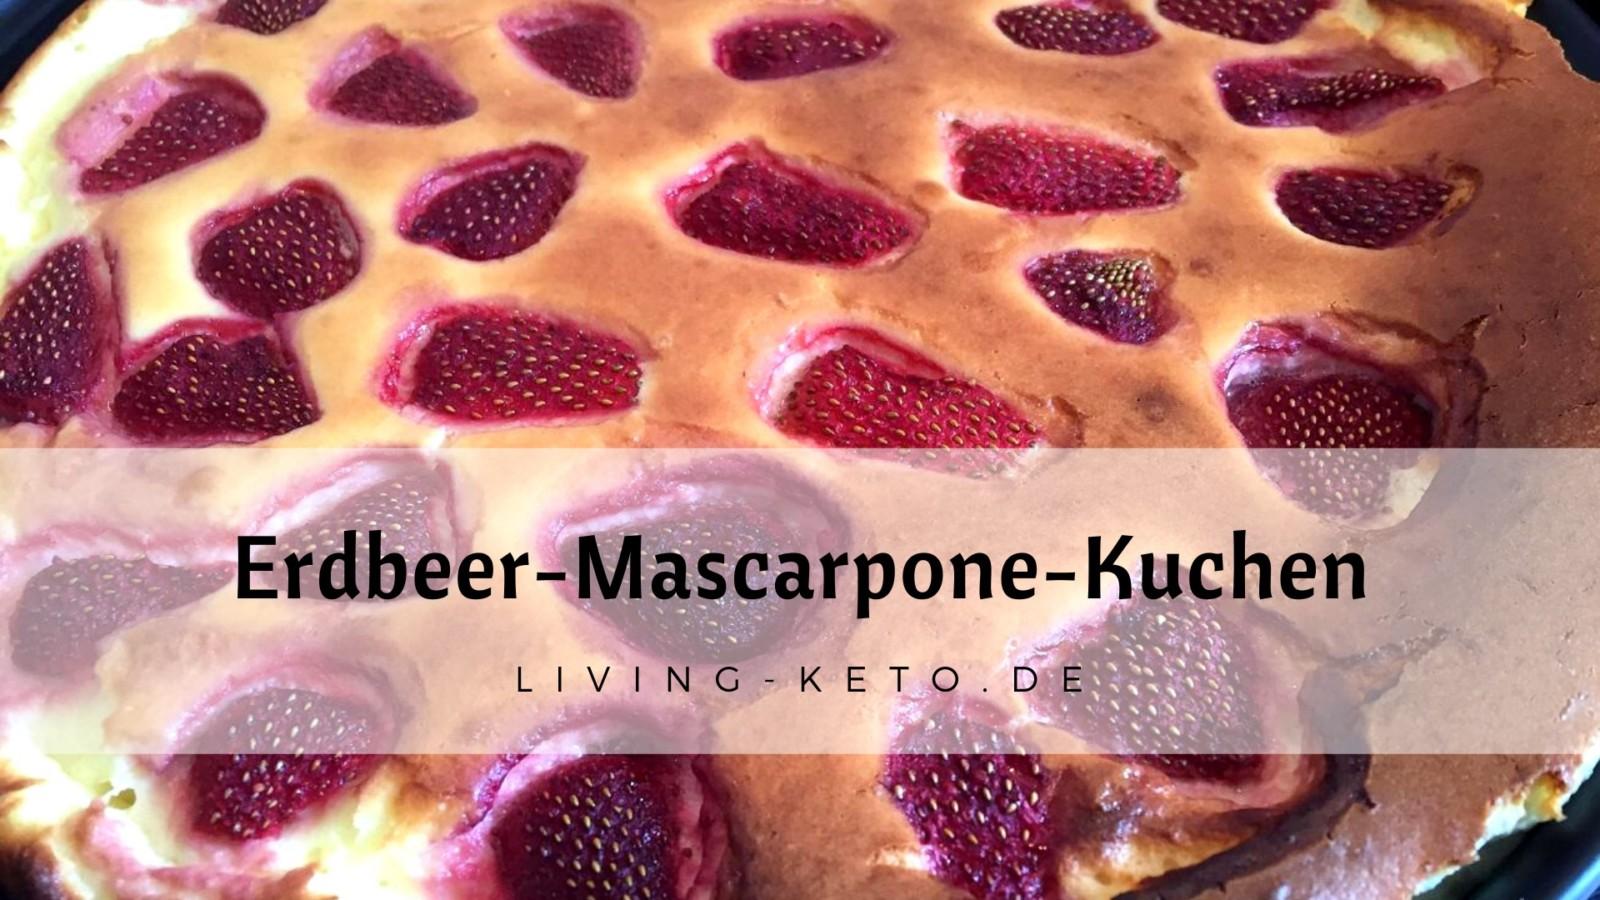 Erdbeer-Mascarpone-Kuchen